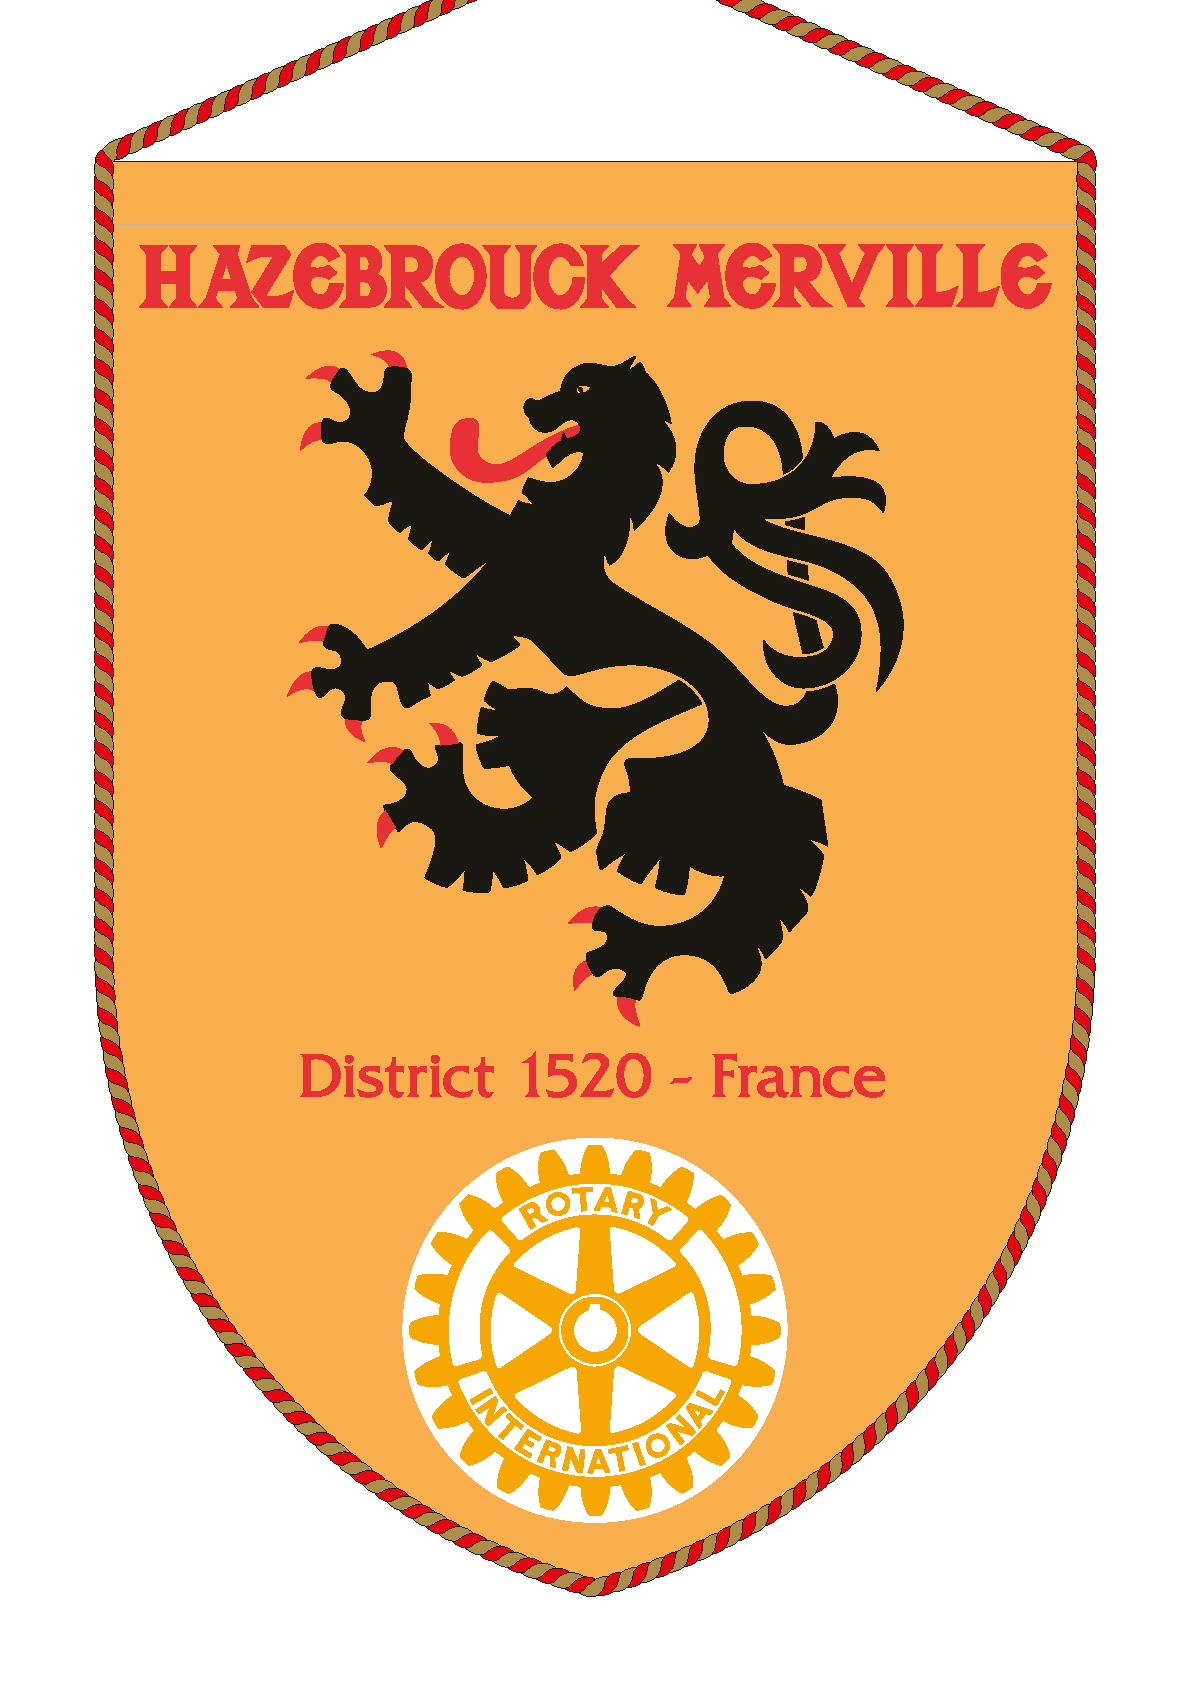 FANION ROTARY CLUB HAZEBROUCK